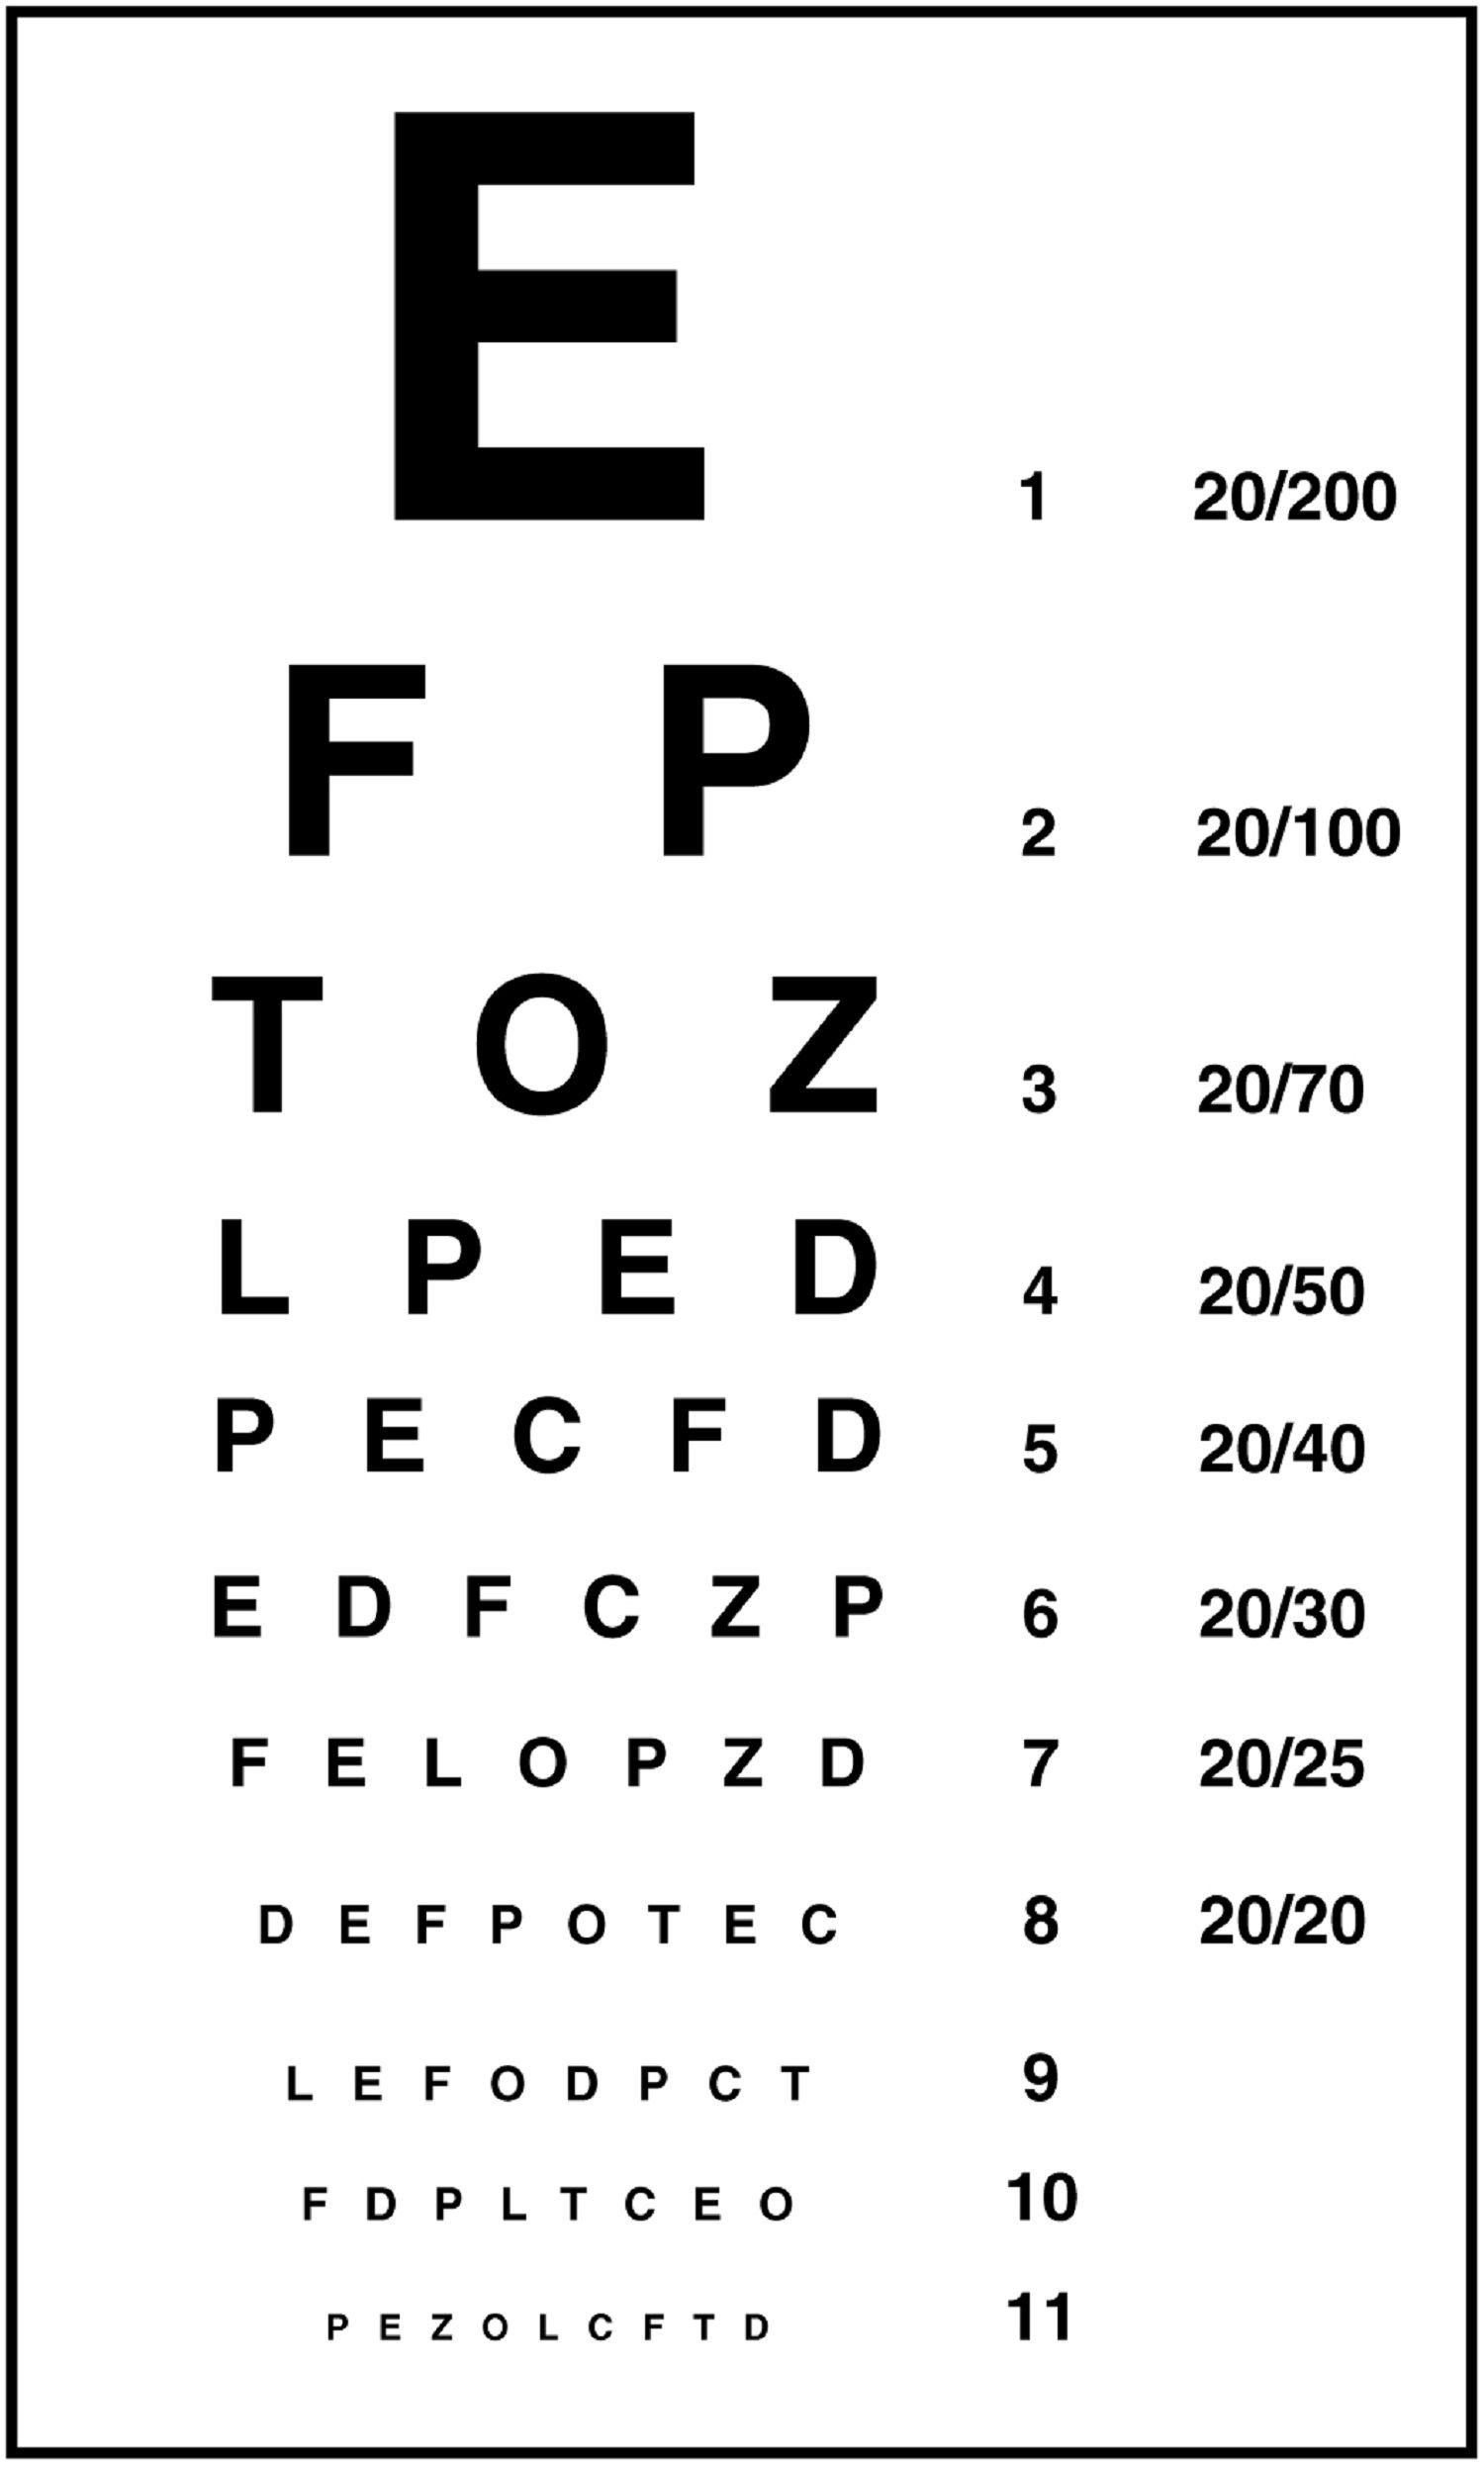 eye exam for diagrams easy wiring diagrams mummy diagram chart eye chart diagram [ 1500 x 2491 Pixel ]